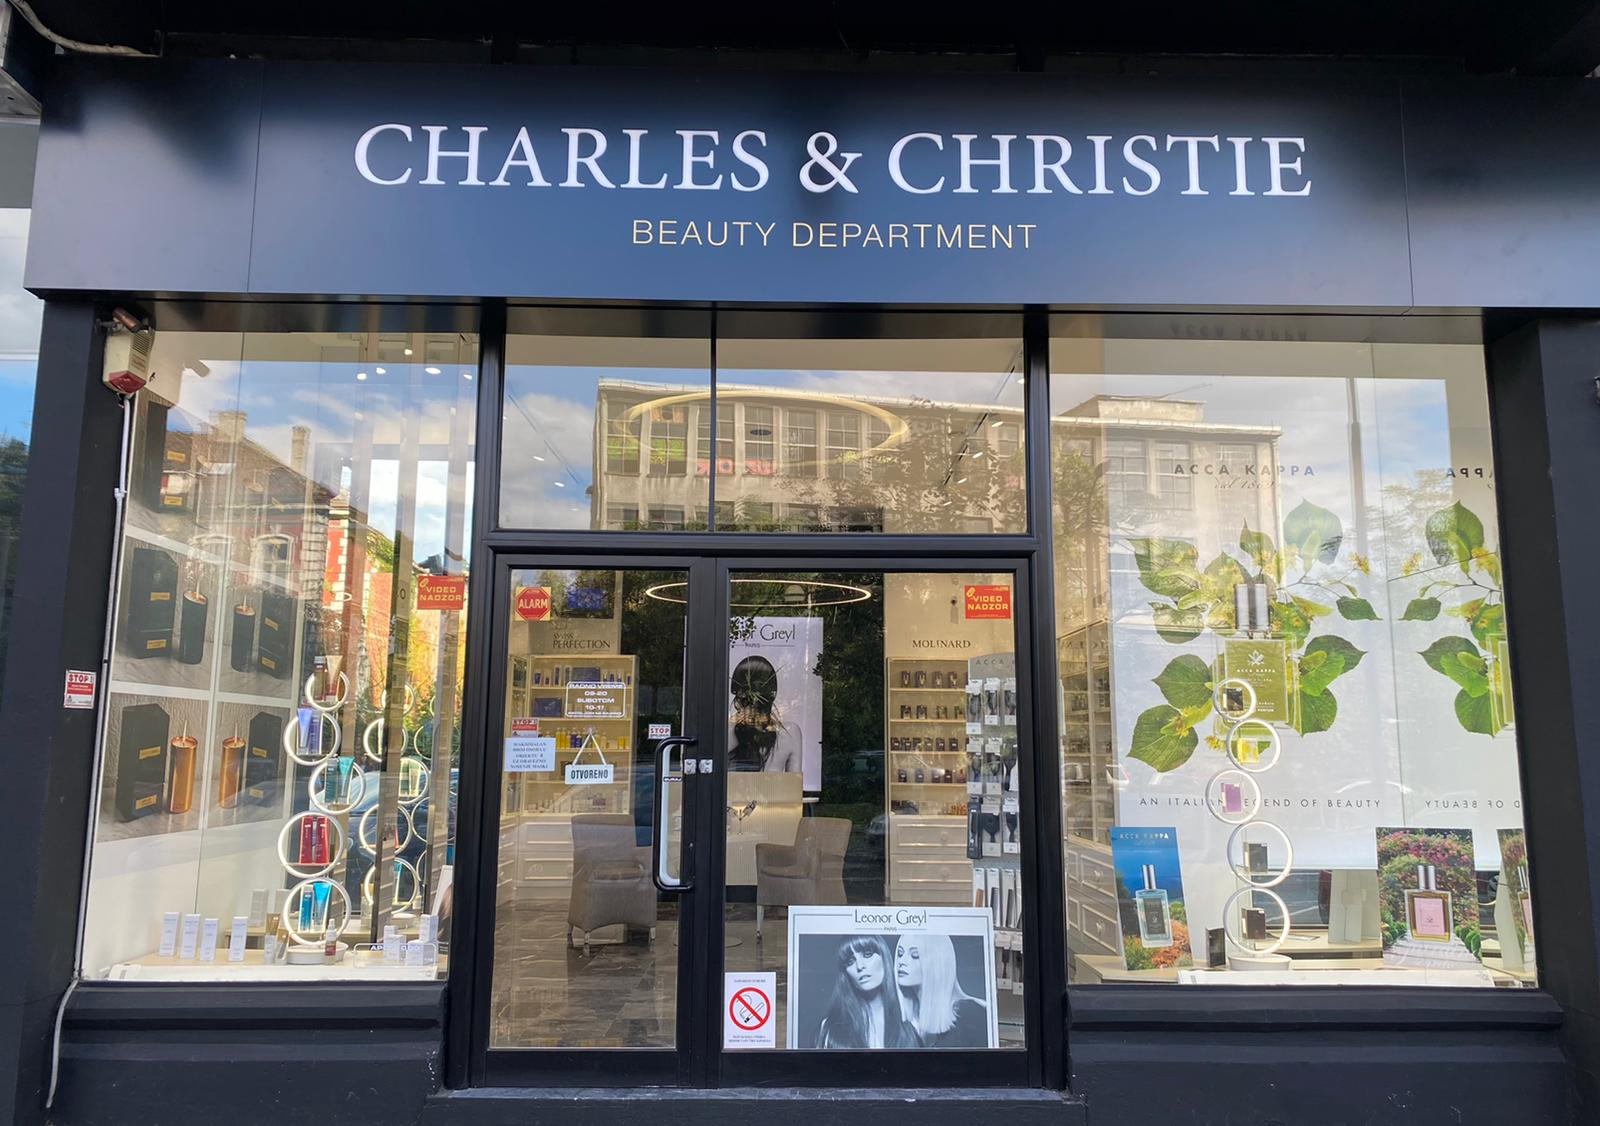 Charles & Christie